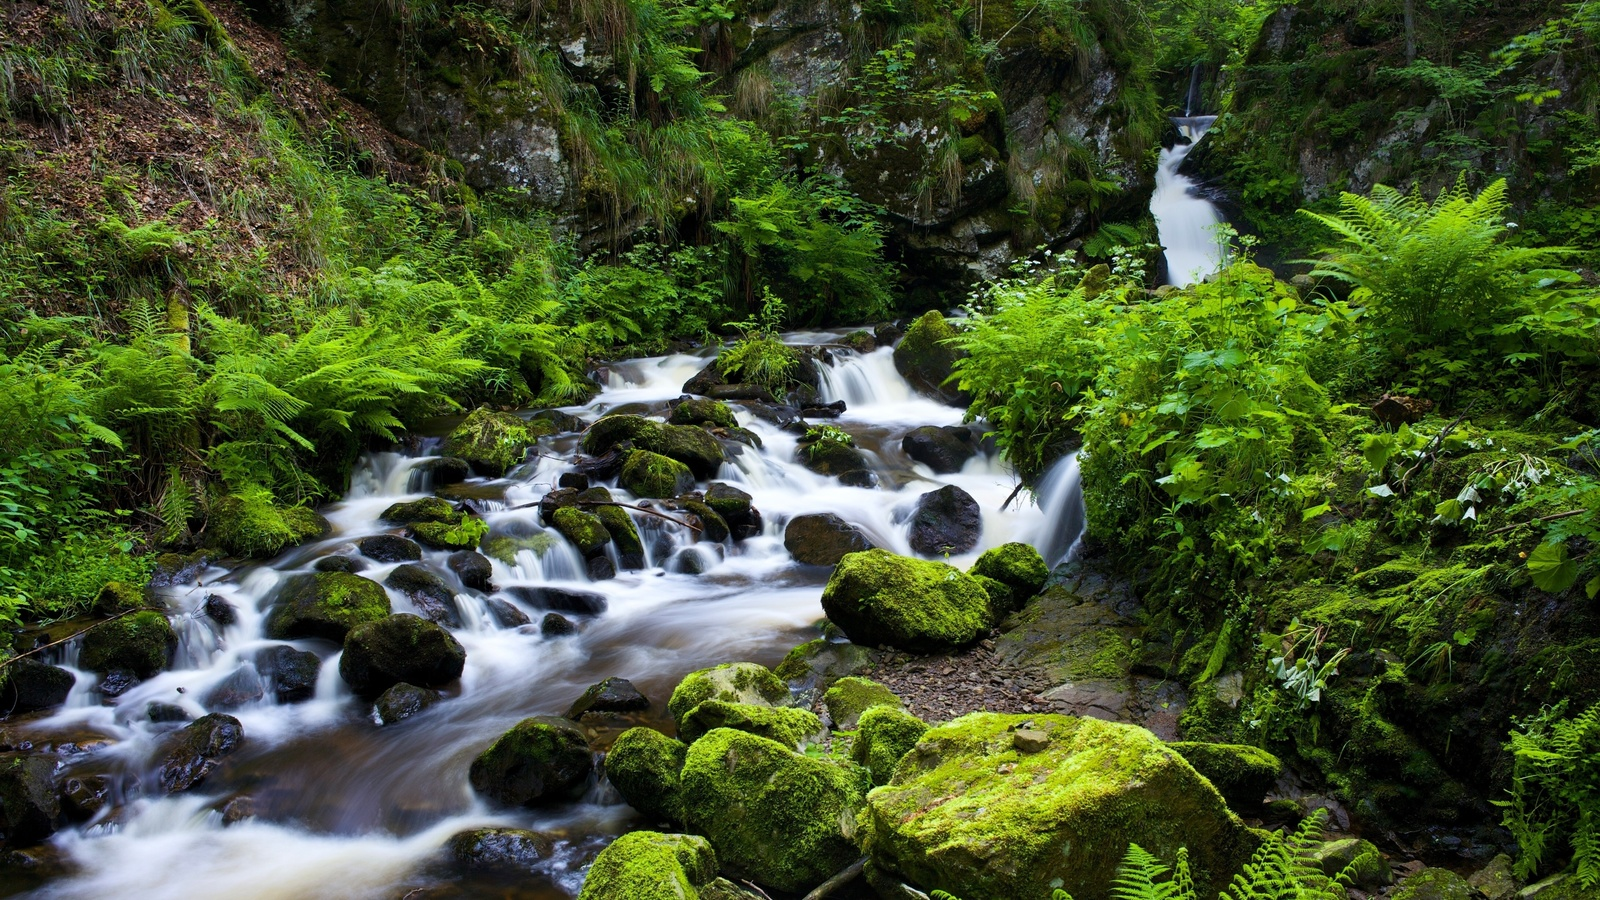 река, природа, воды